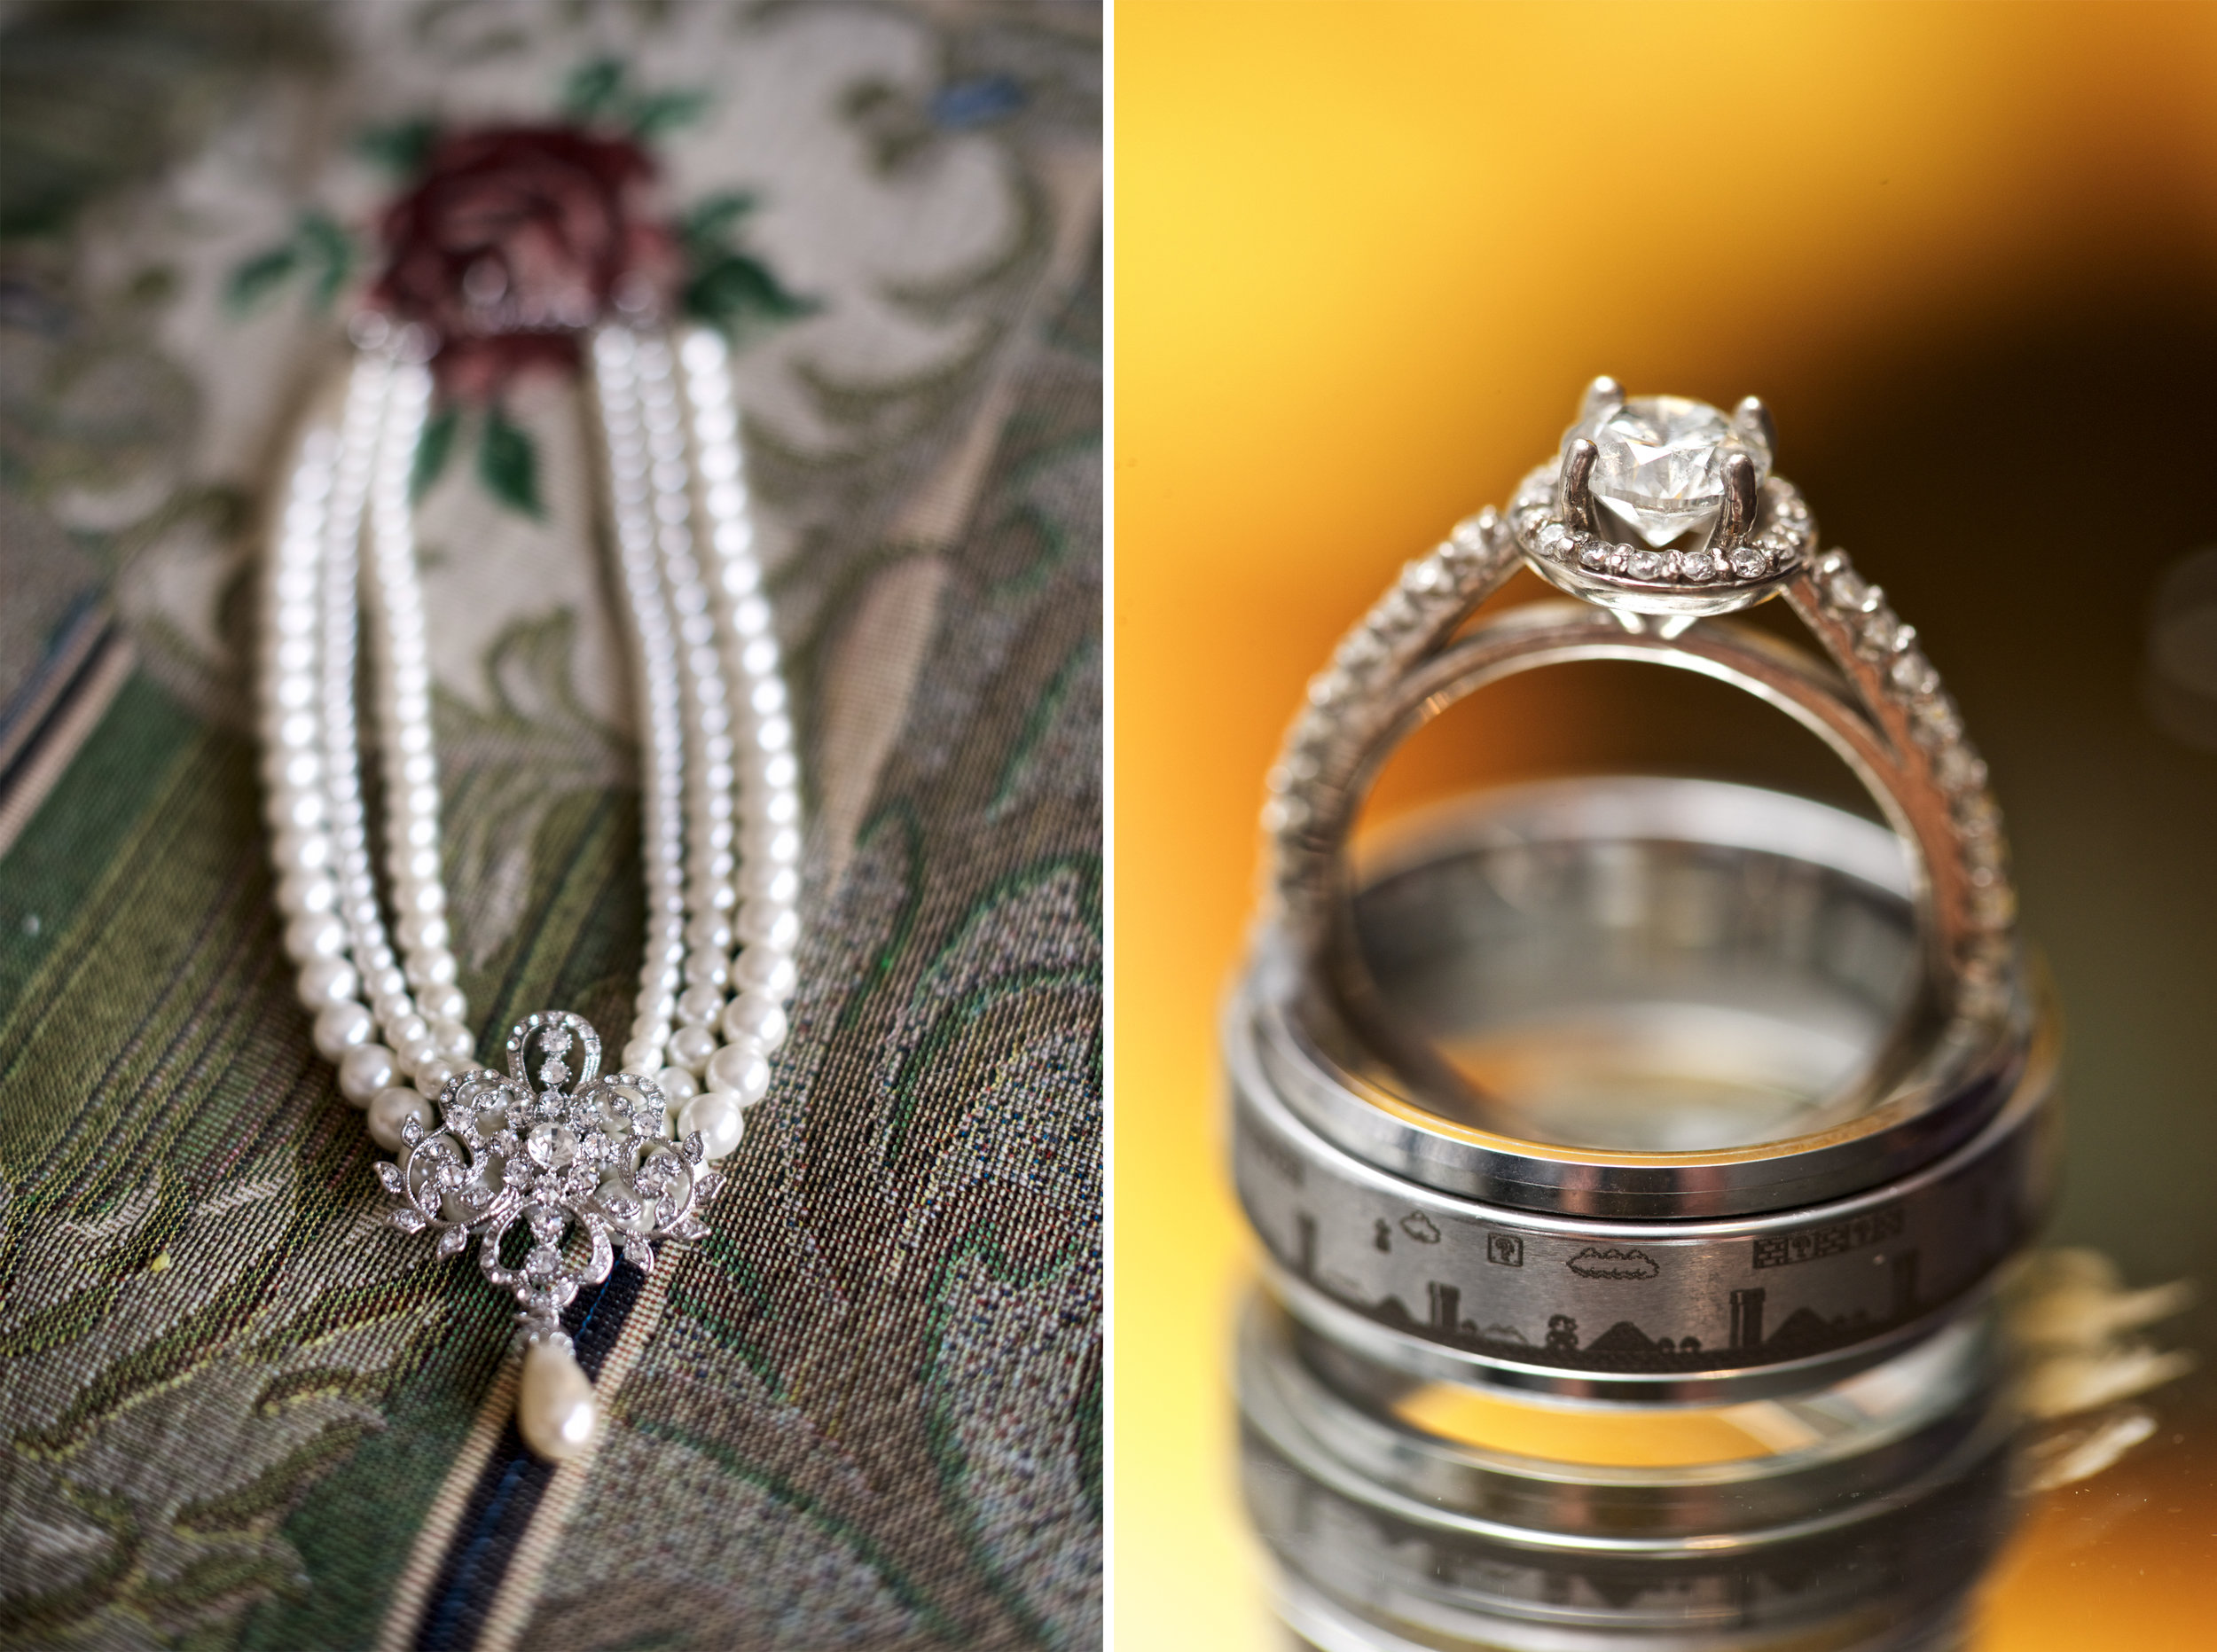 Lippincott manor wedding, wallkill ny wedding, photography, photos q.jpg